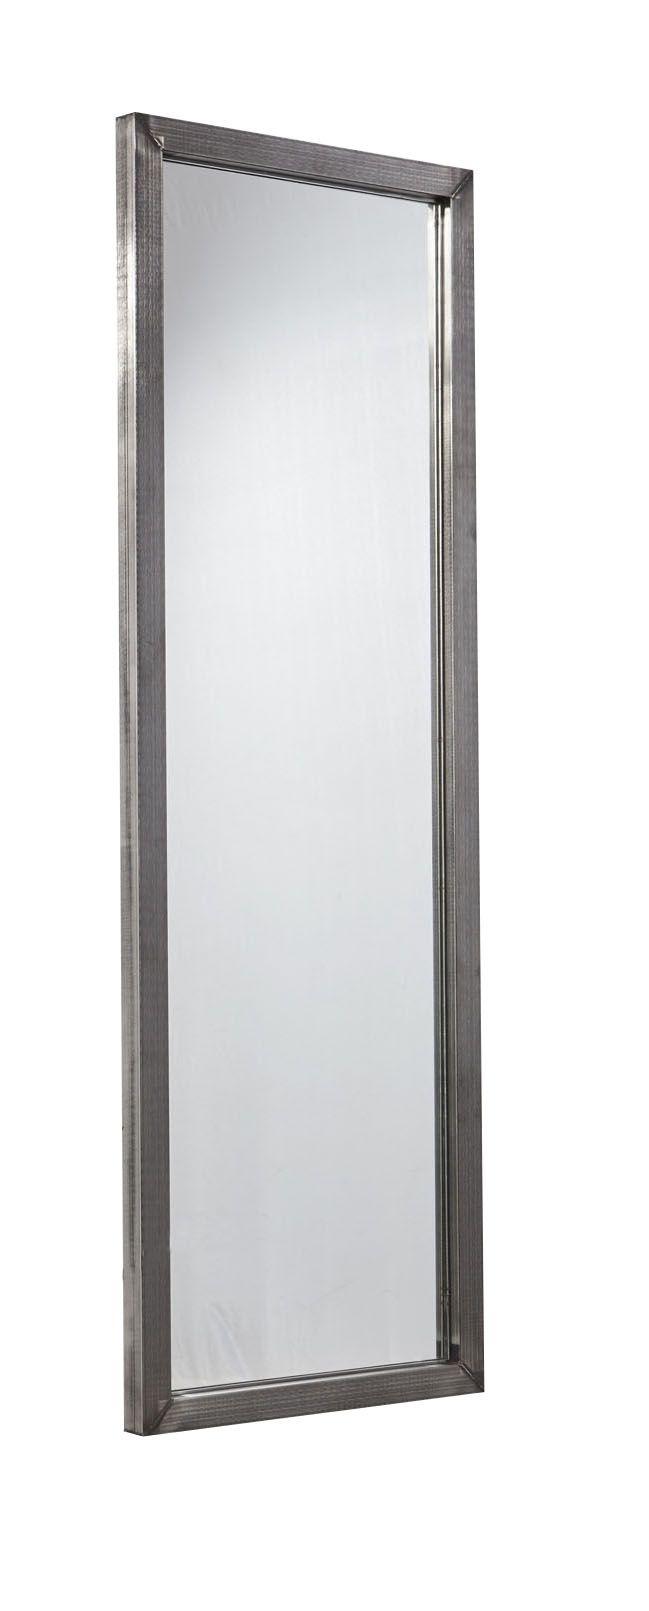 Davidi design hugo spiegel small davidi design aanbieding kopen - Designer woonkamer spiegel ...